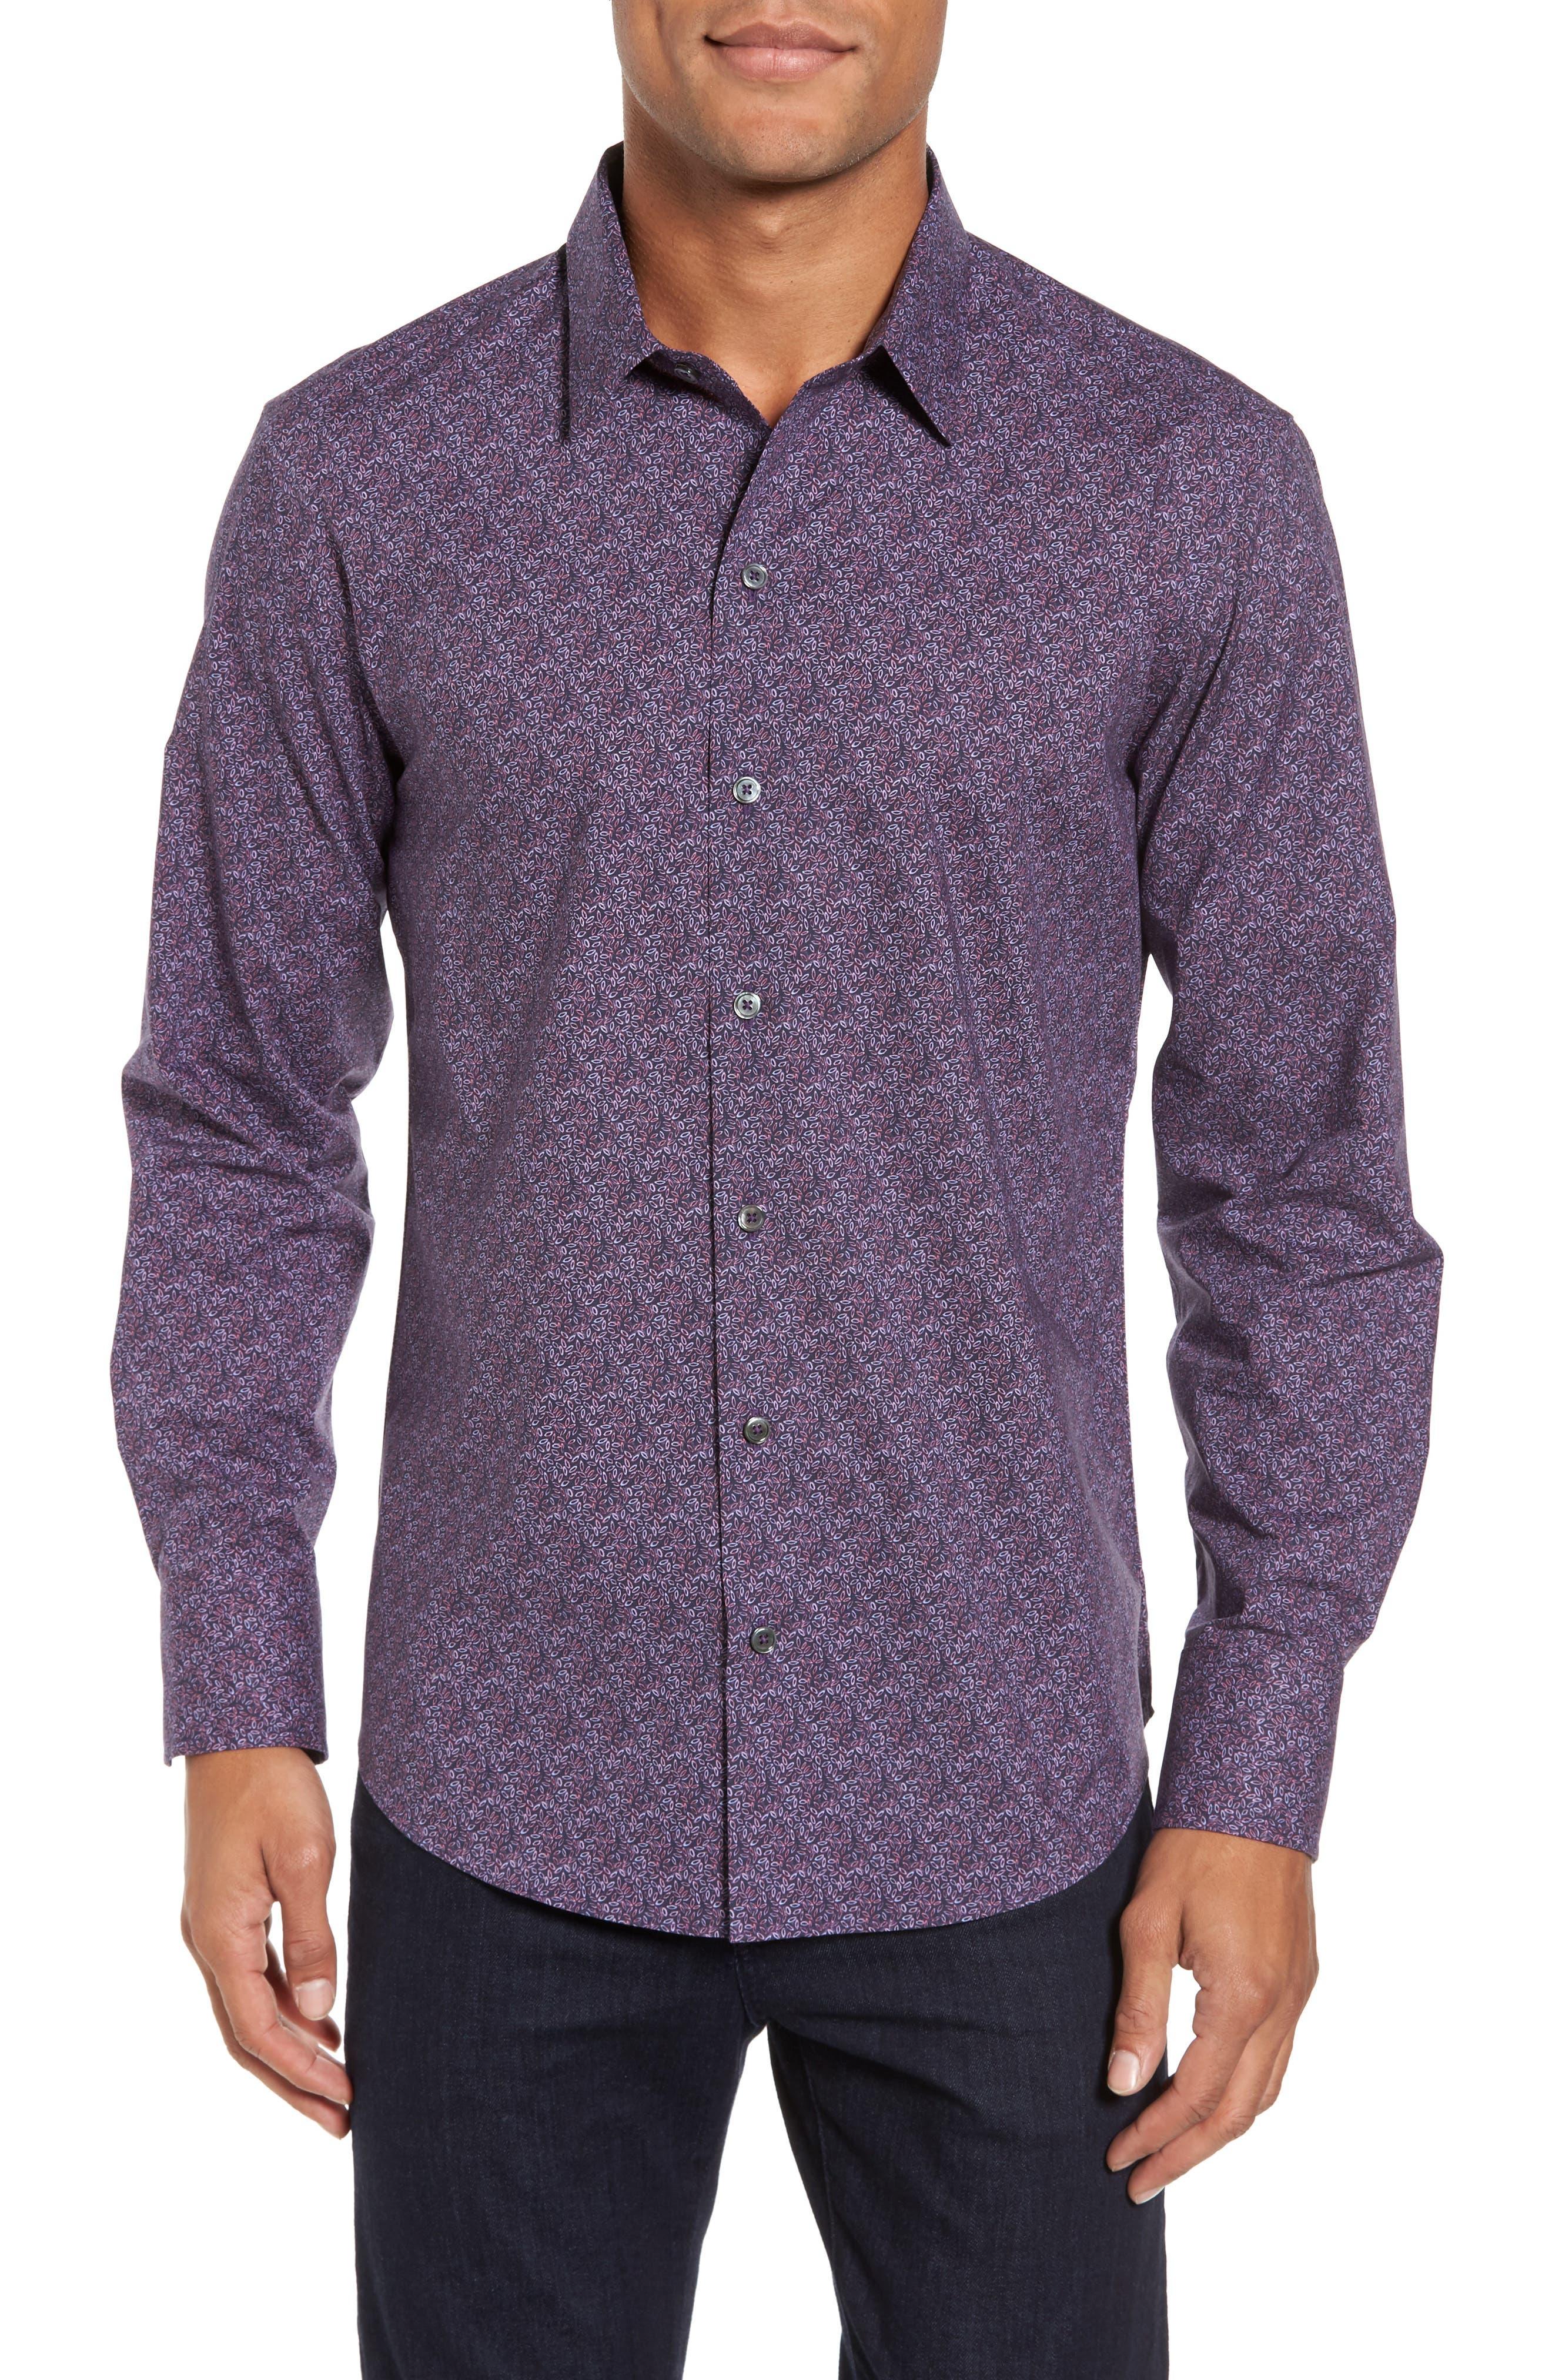 Cristobal Slim Fit Print Sport Shirt,                             Main thumbnail 1, color,                             500